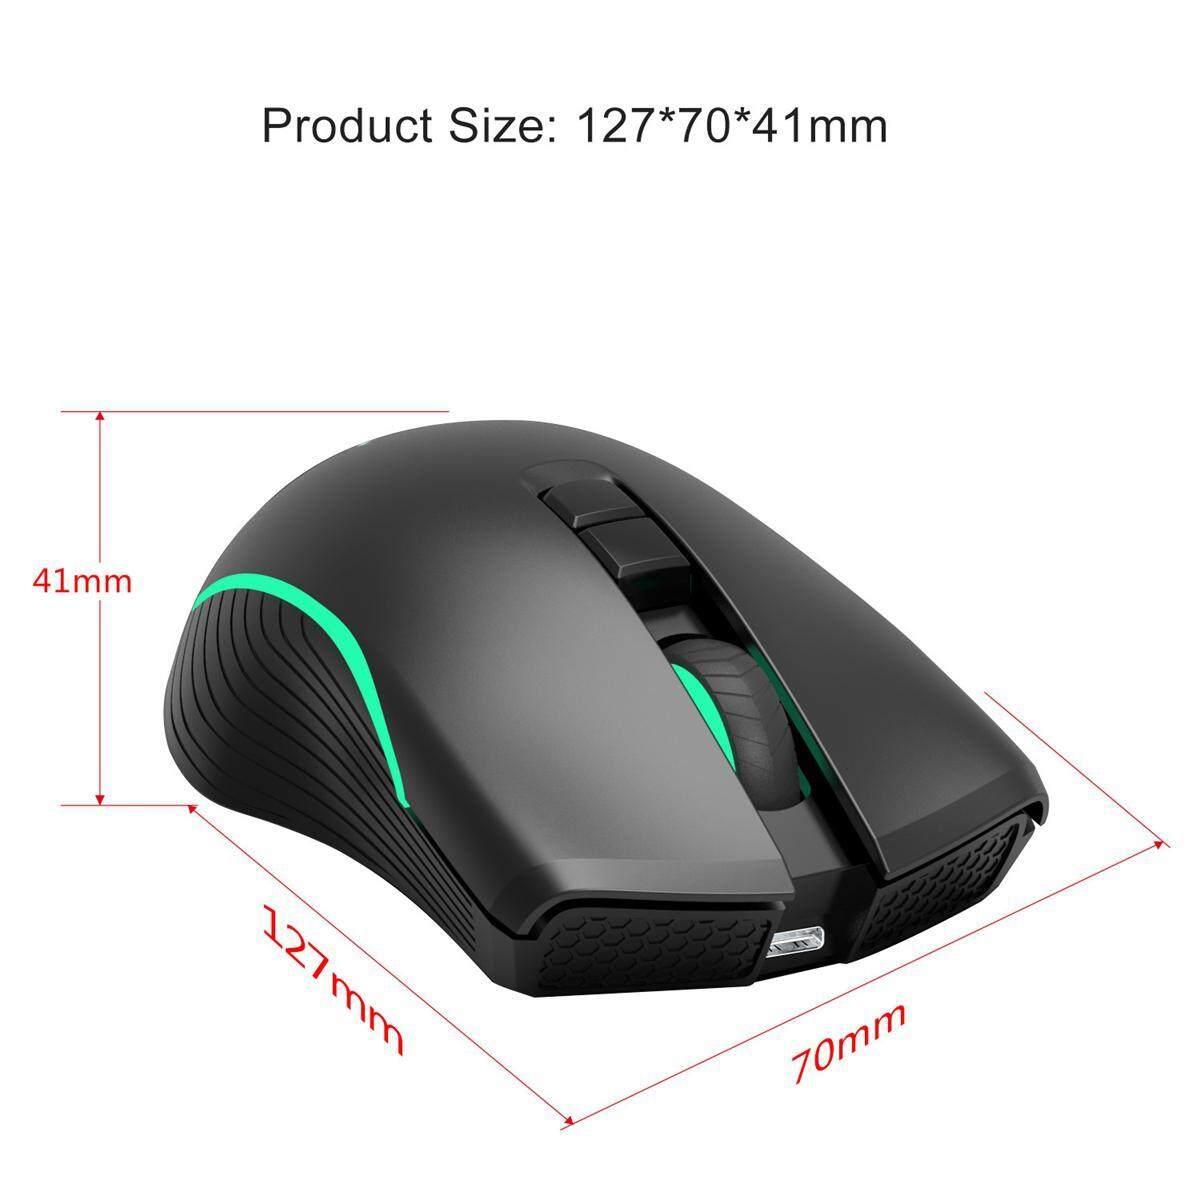 Aolvo 2.4 GHz USB Pengisian Nirkabel Optik Mouse Gaming Tikus 2400DP untuk Desktop Laptop PC Colorful ...